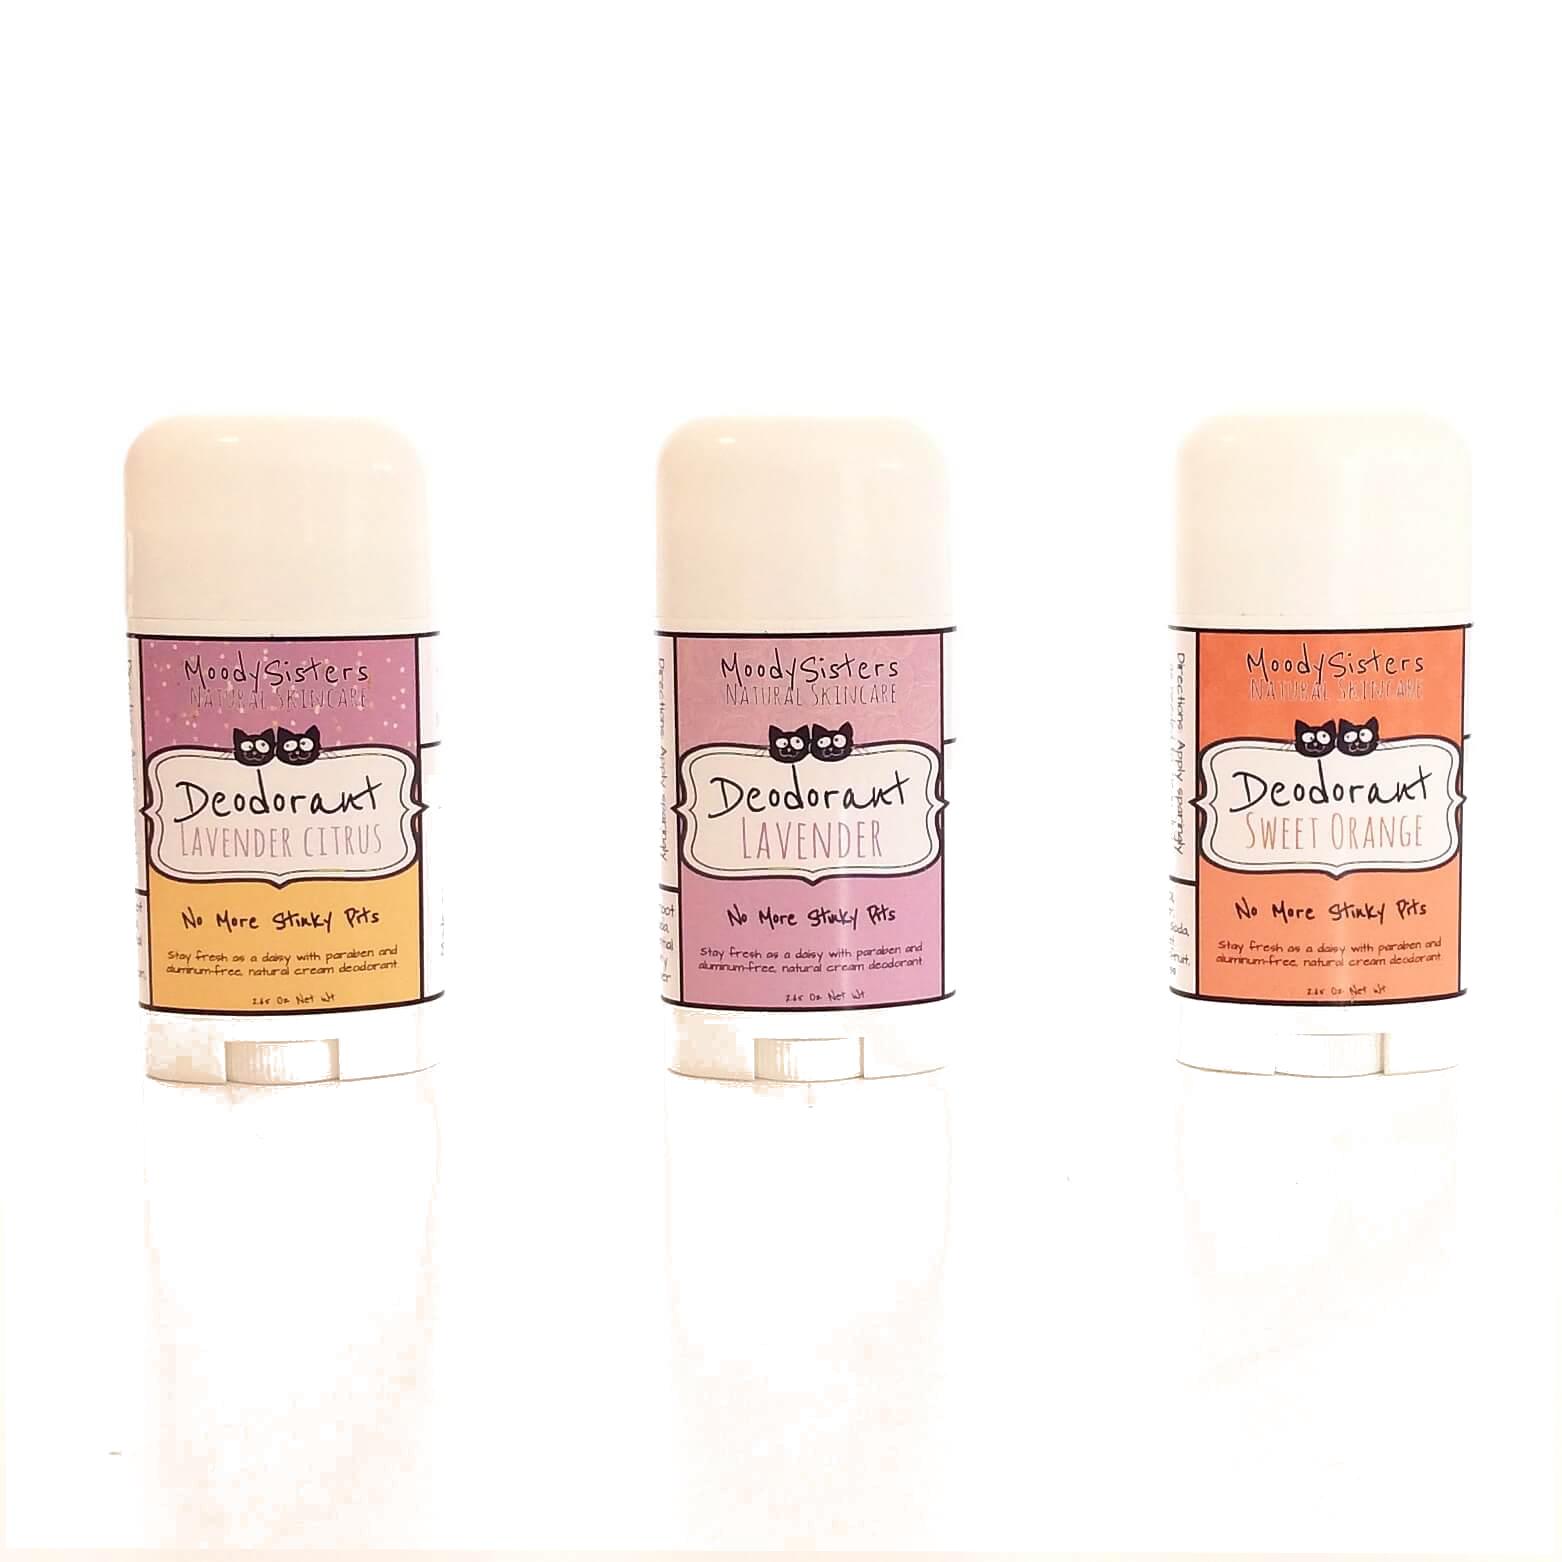 Deodorant of your choice + 1 Grand Winner Custom Woolen Moss Tee